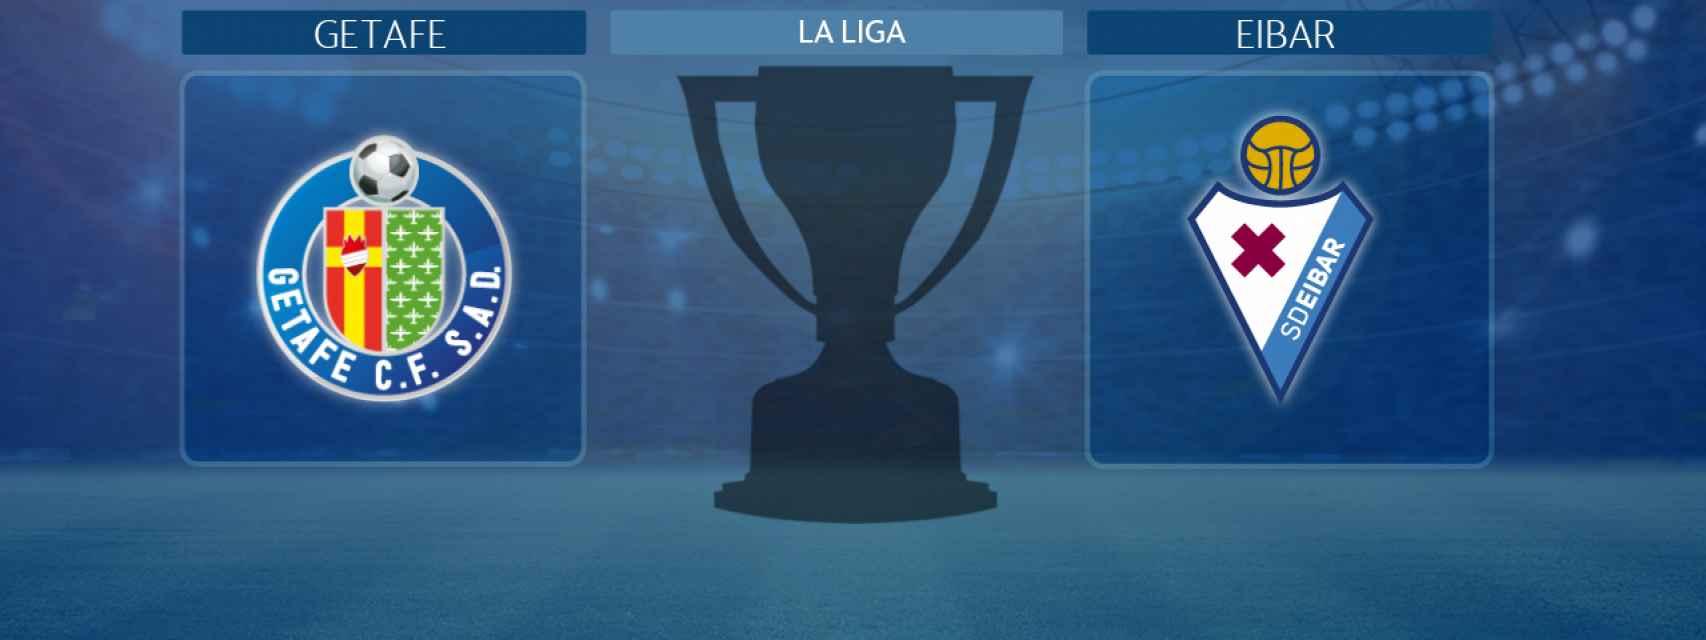 Getafe - Eibar, partido de La Liga